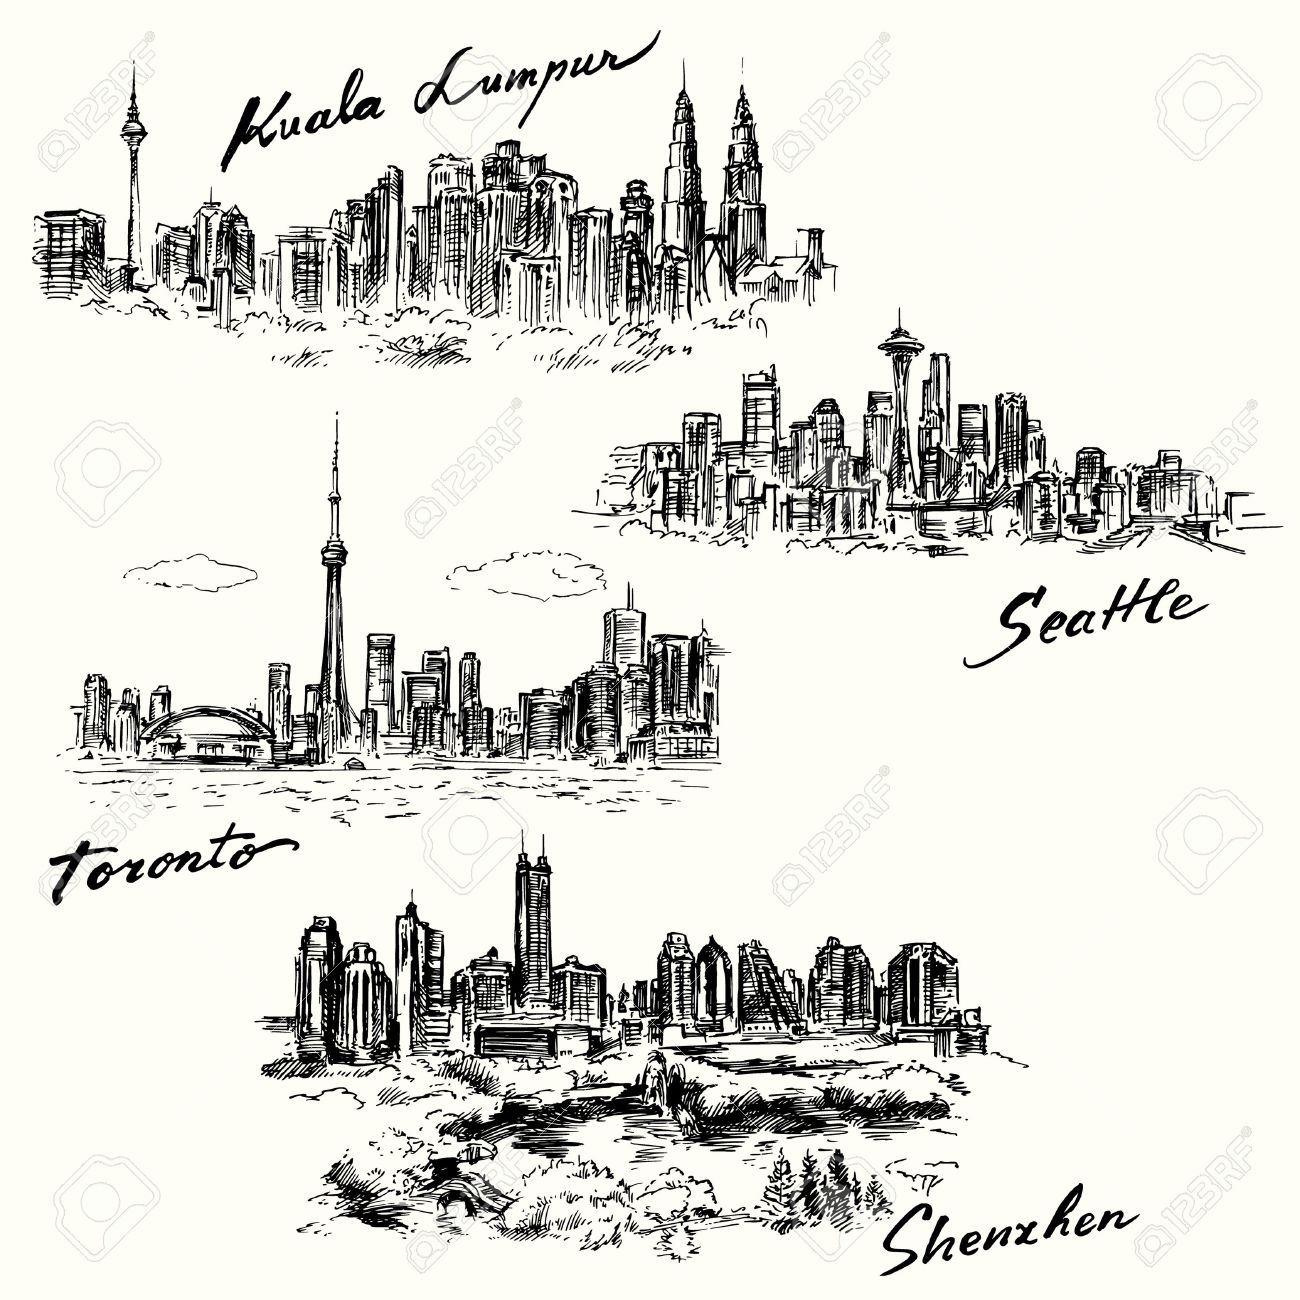 Toronto, Seattle, Kuala Lumpur, Shenzhen Standard-Bild - 31367189